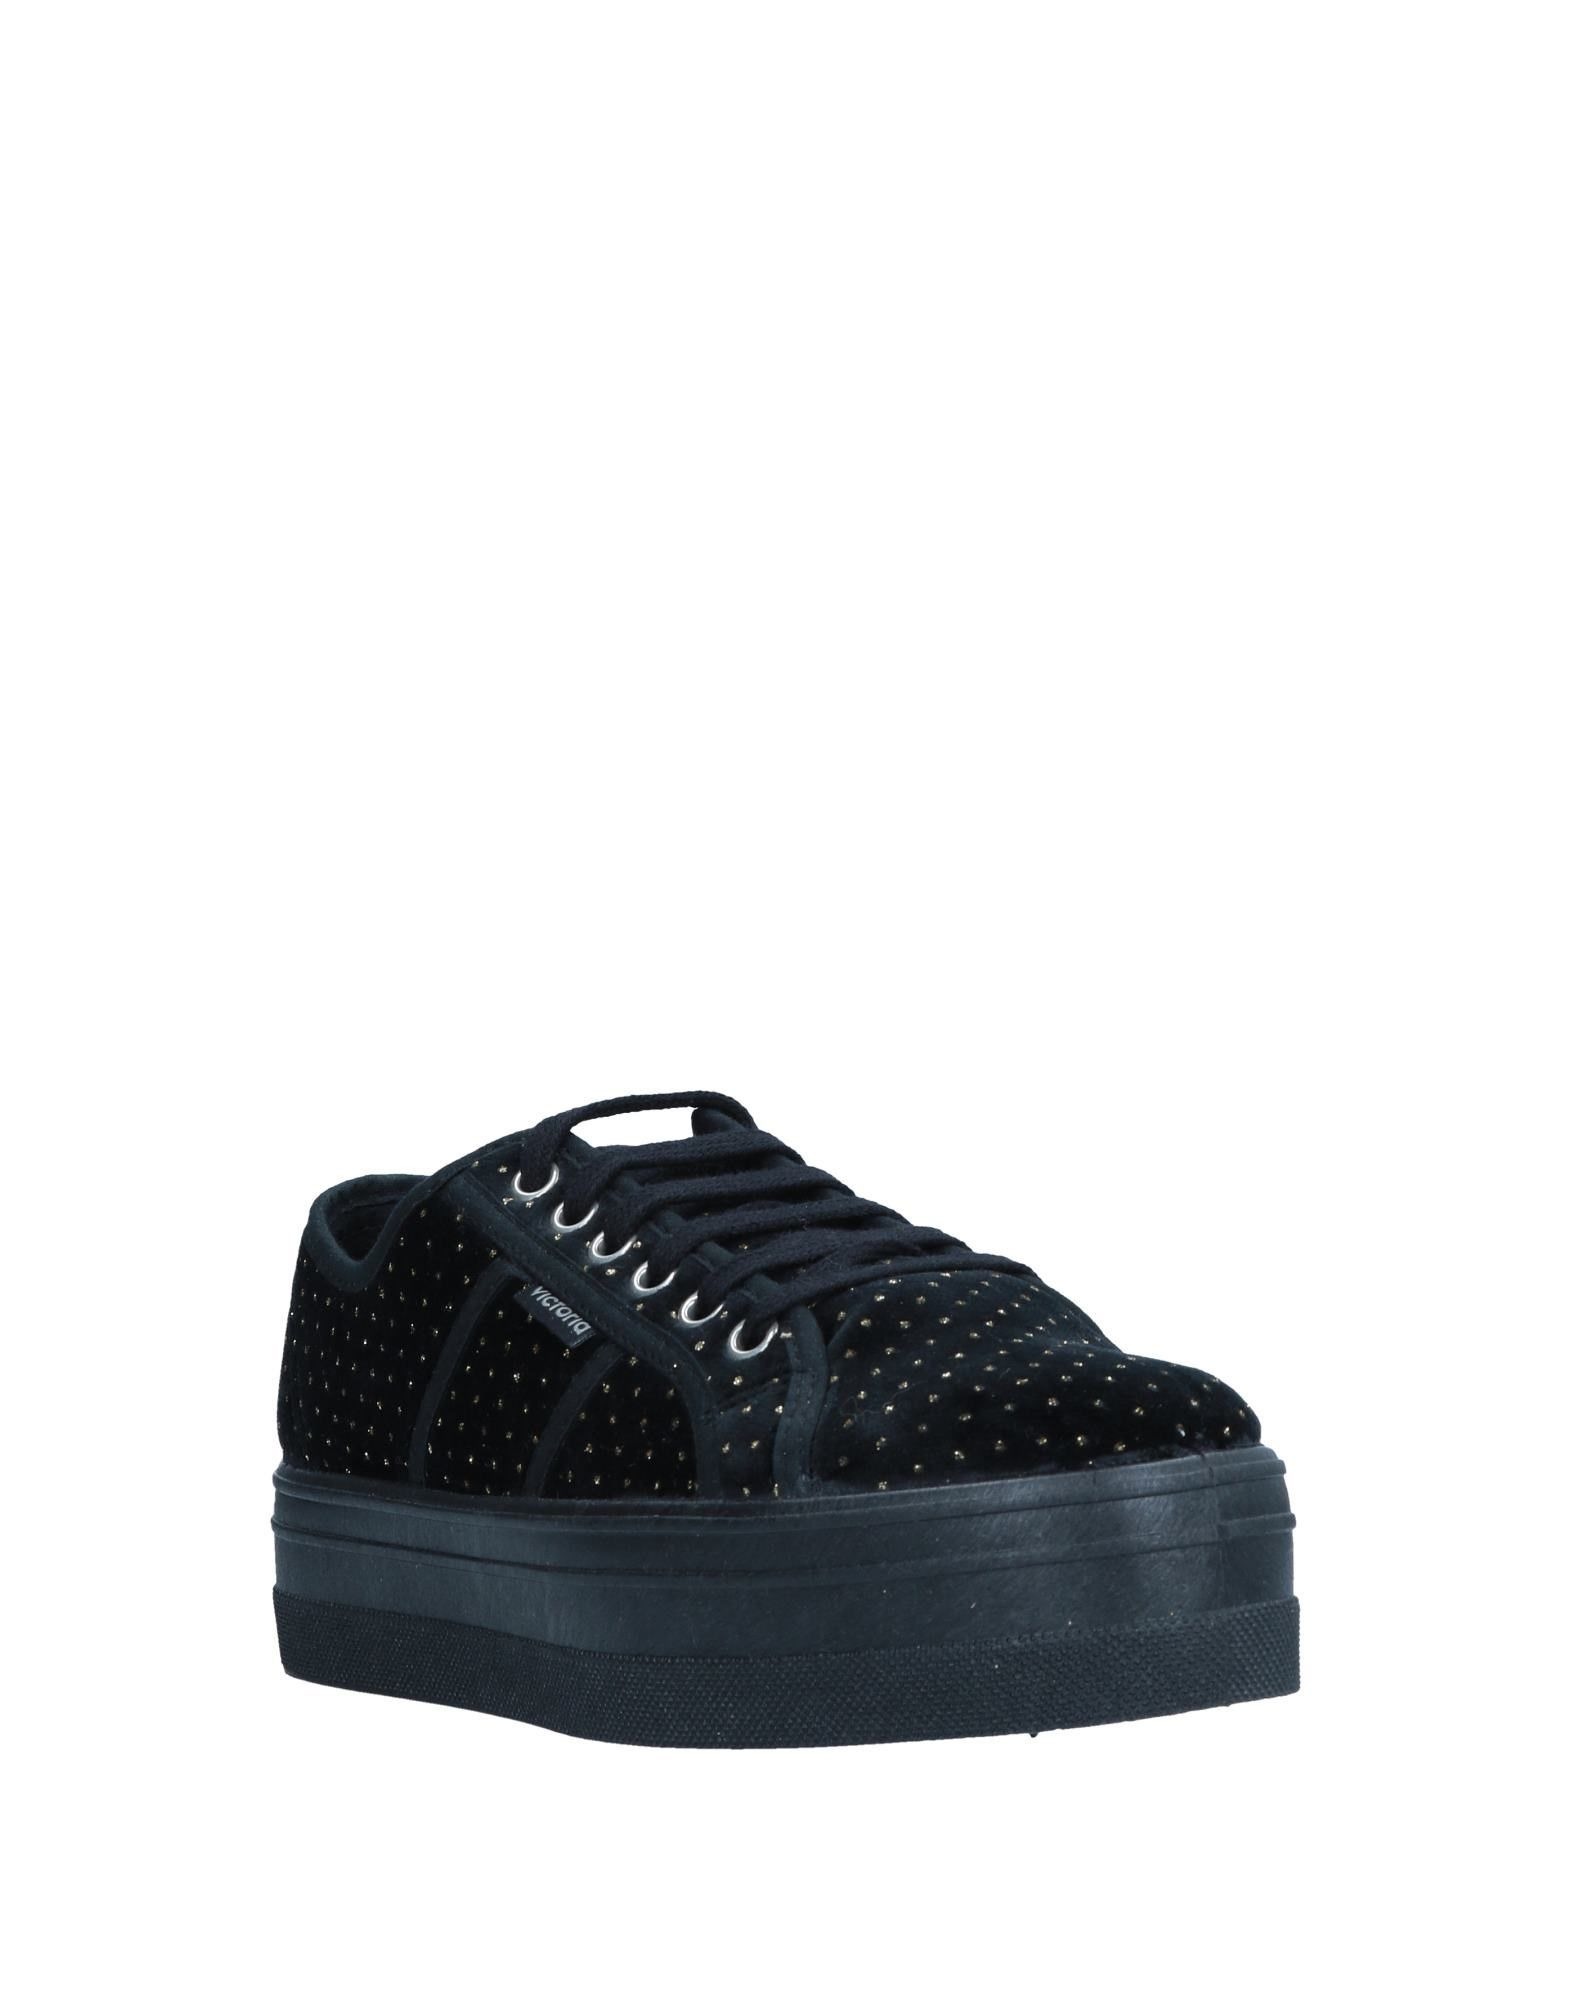 Victoria Sneakers Damen  11546088QH Gute Qualität beliebte Schuhe Schuhe Schuhe 733146